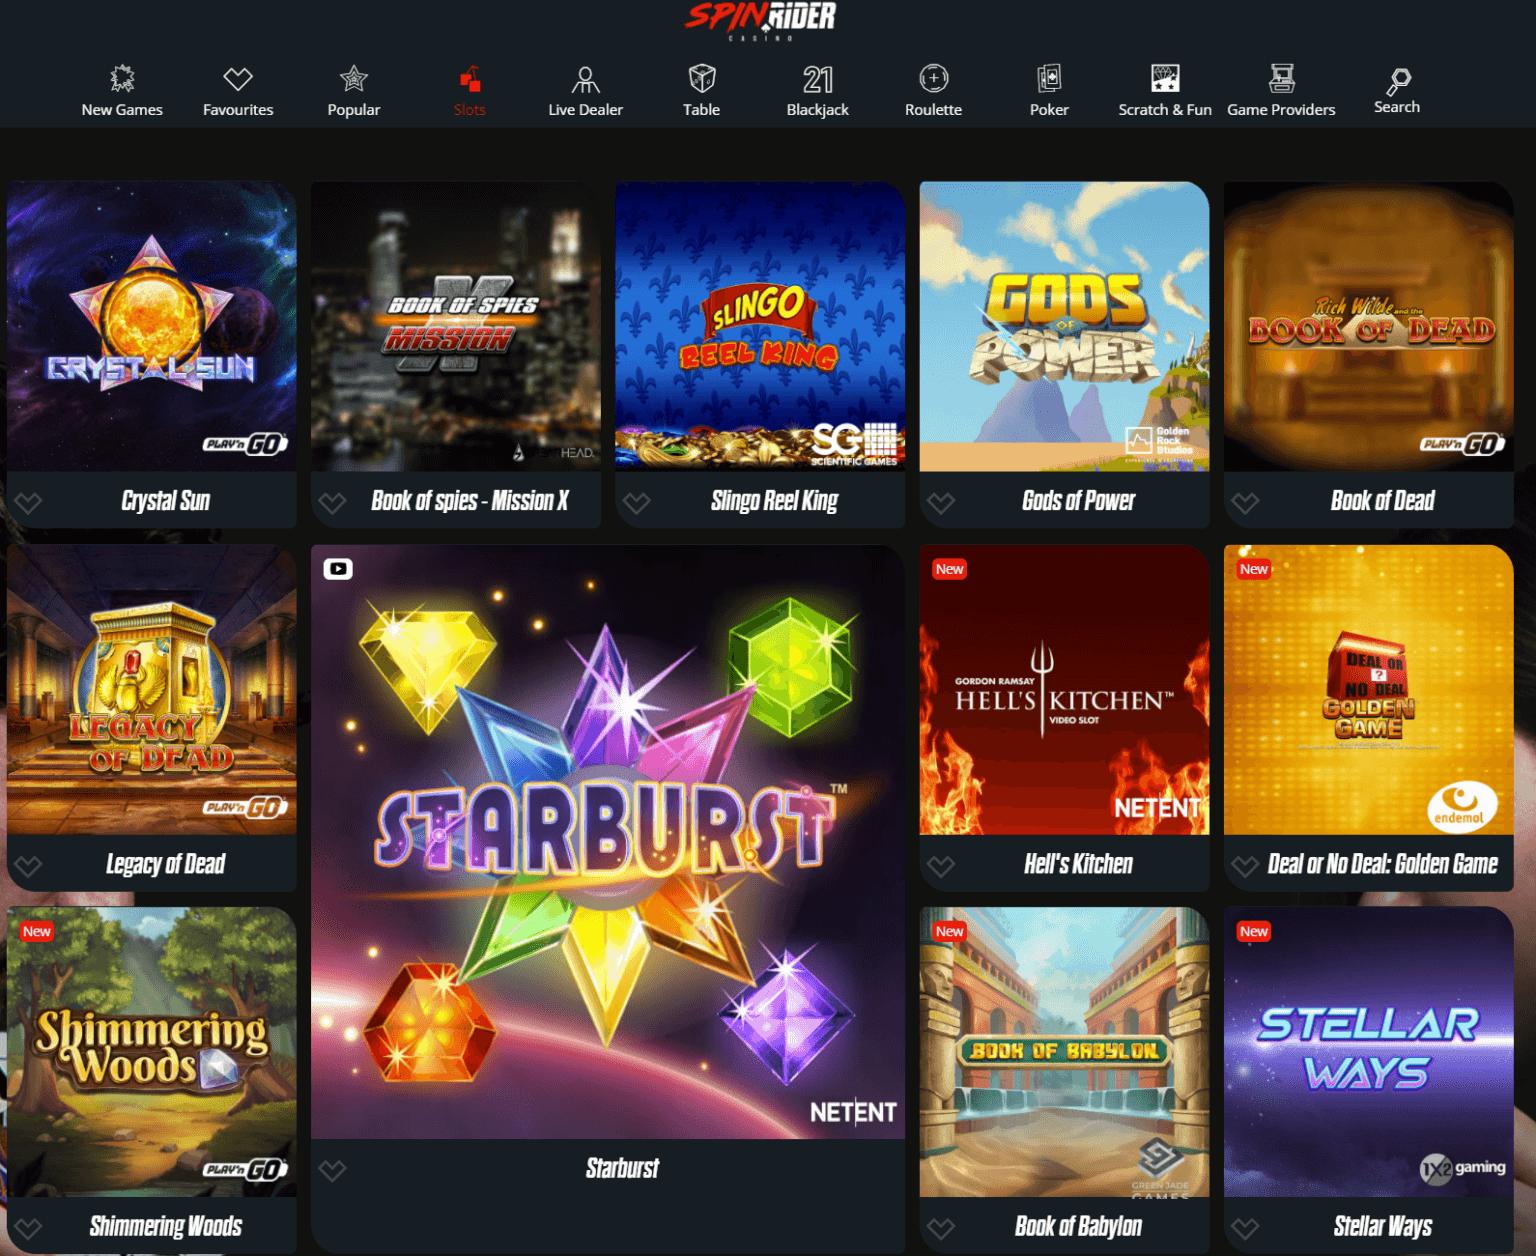 A screenshot showing the various slots you can play at Spin Rider